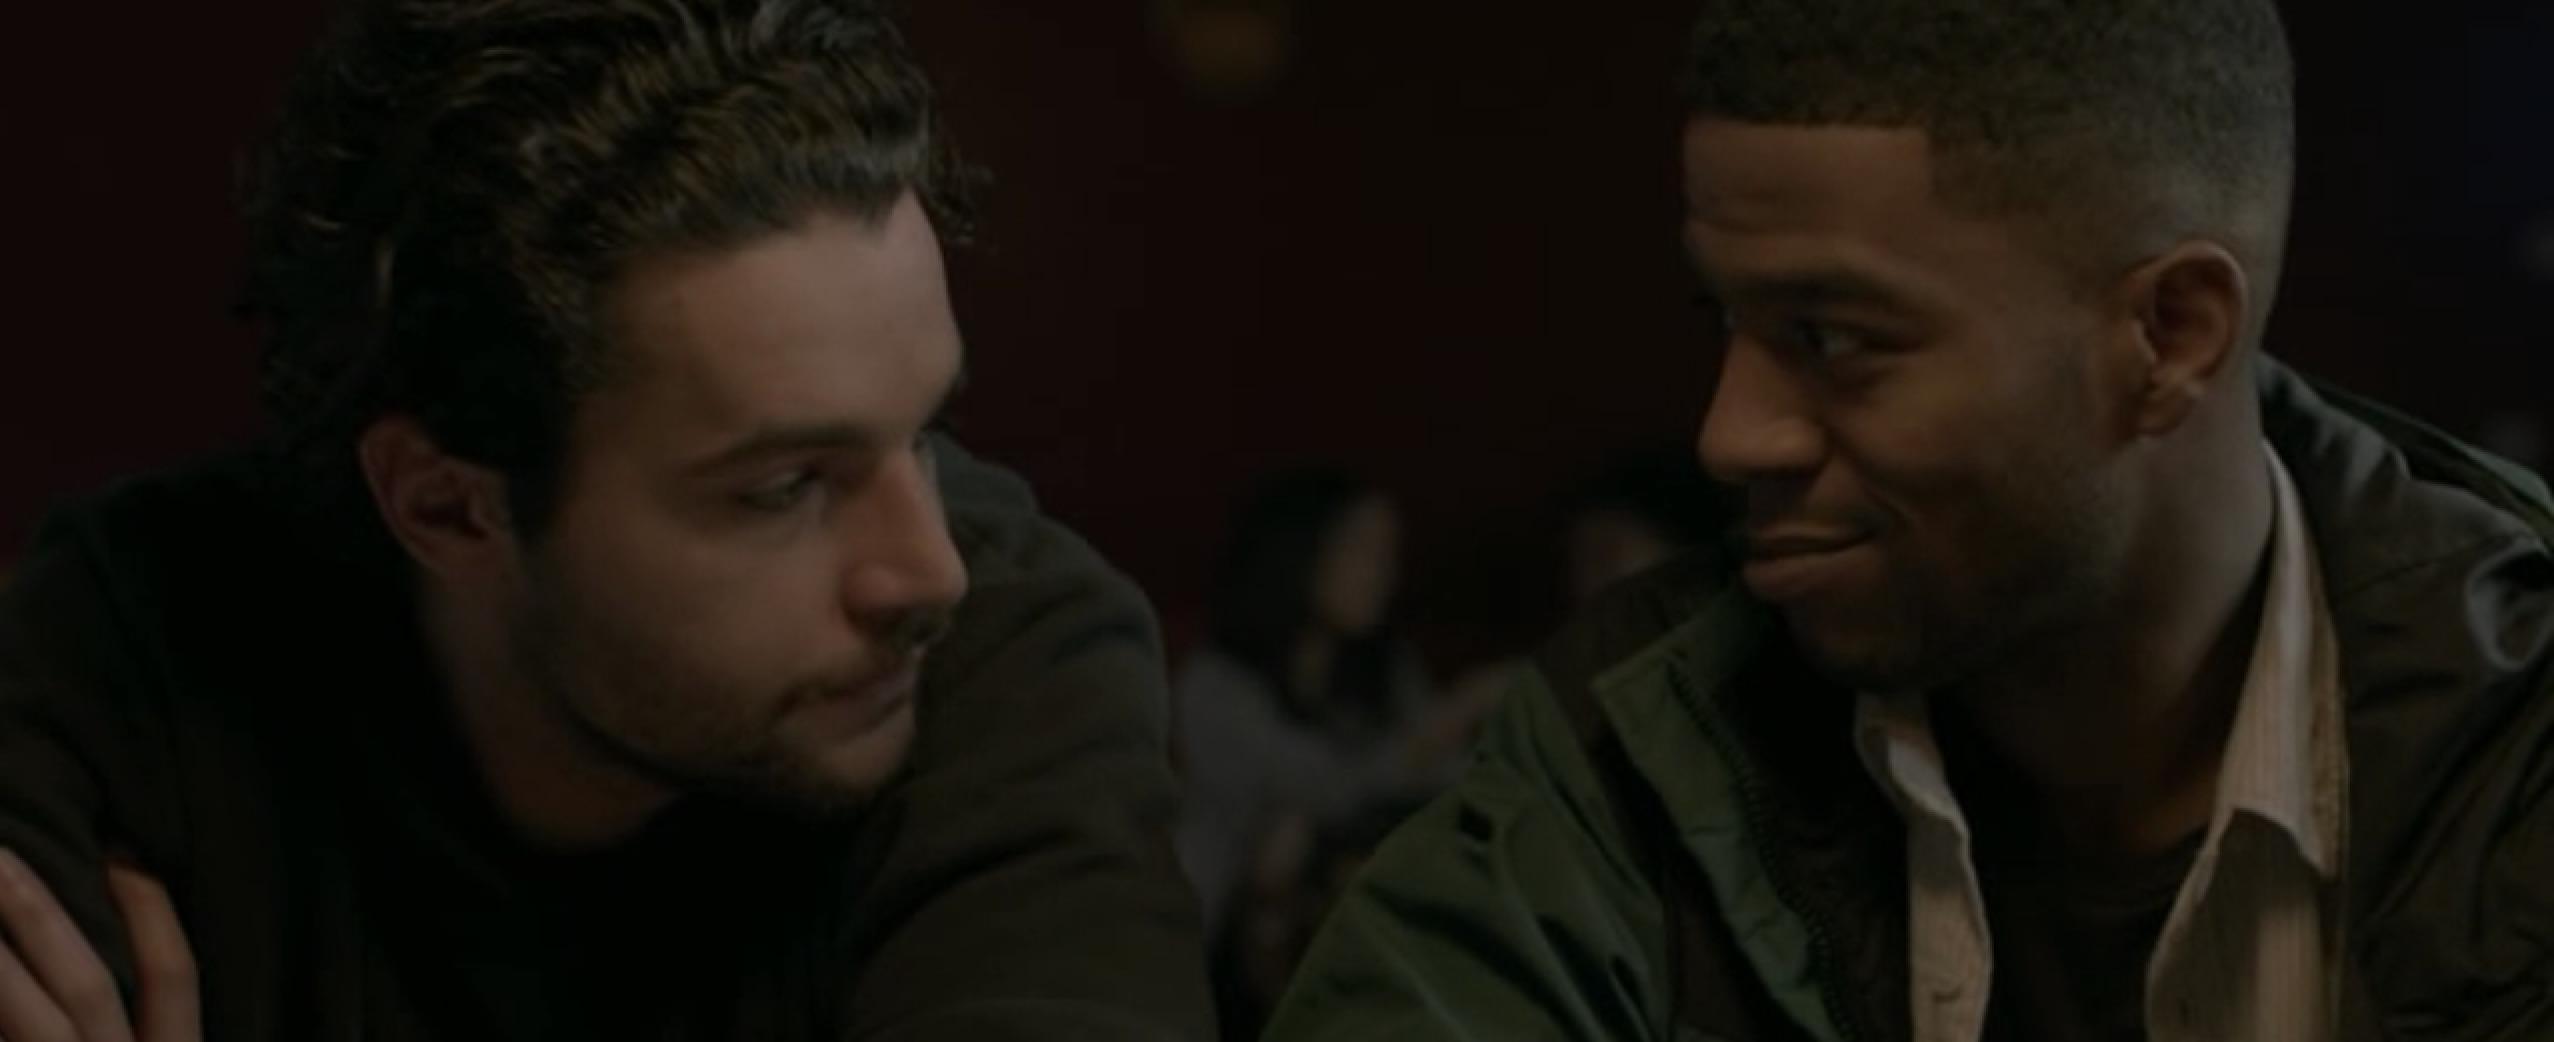 Chris Abbot and Scott Mescudi in 'James White'